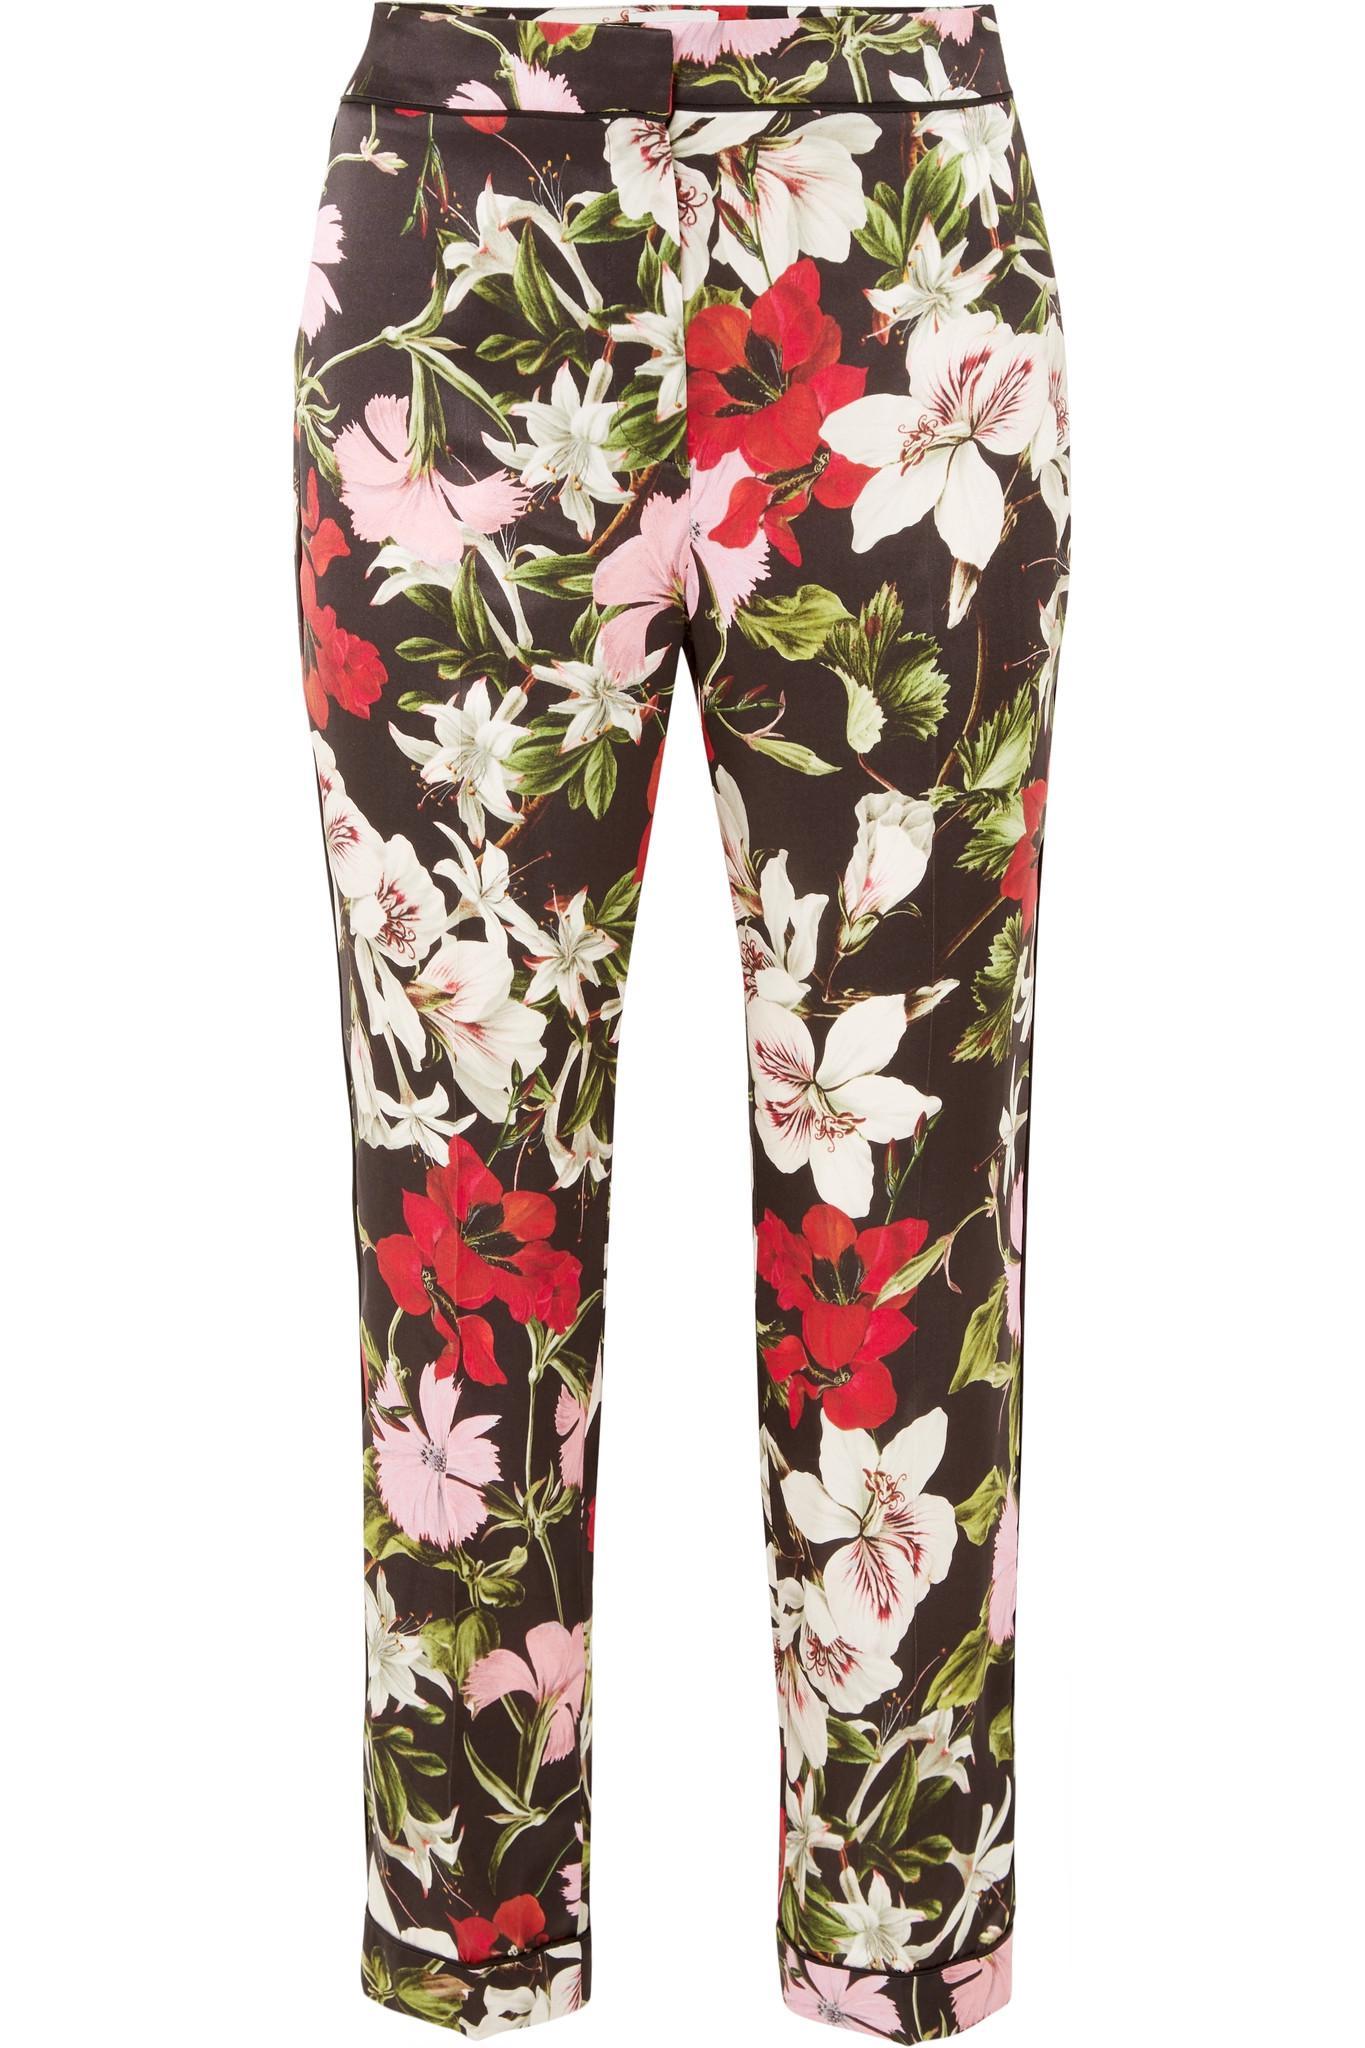 Ginnie floral-printed silk trousers Erdem Wholesale Price Sale Online 34eObJ0O55